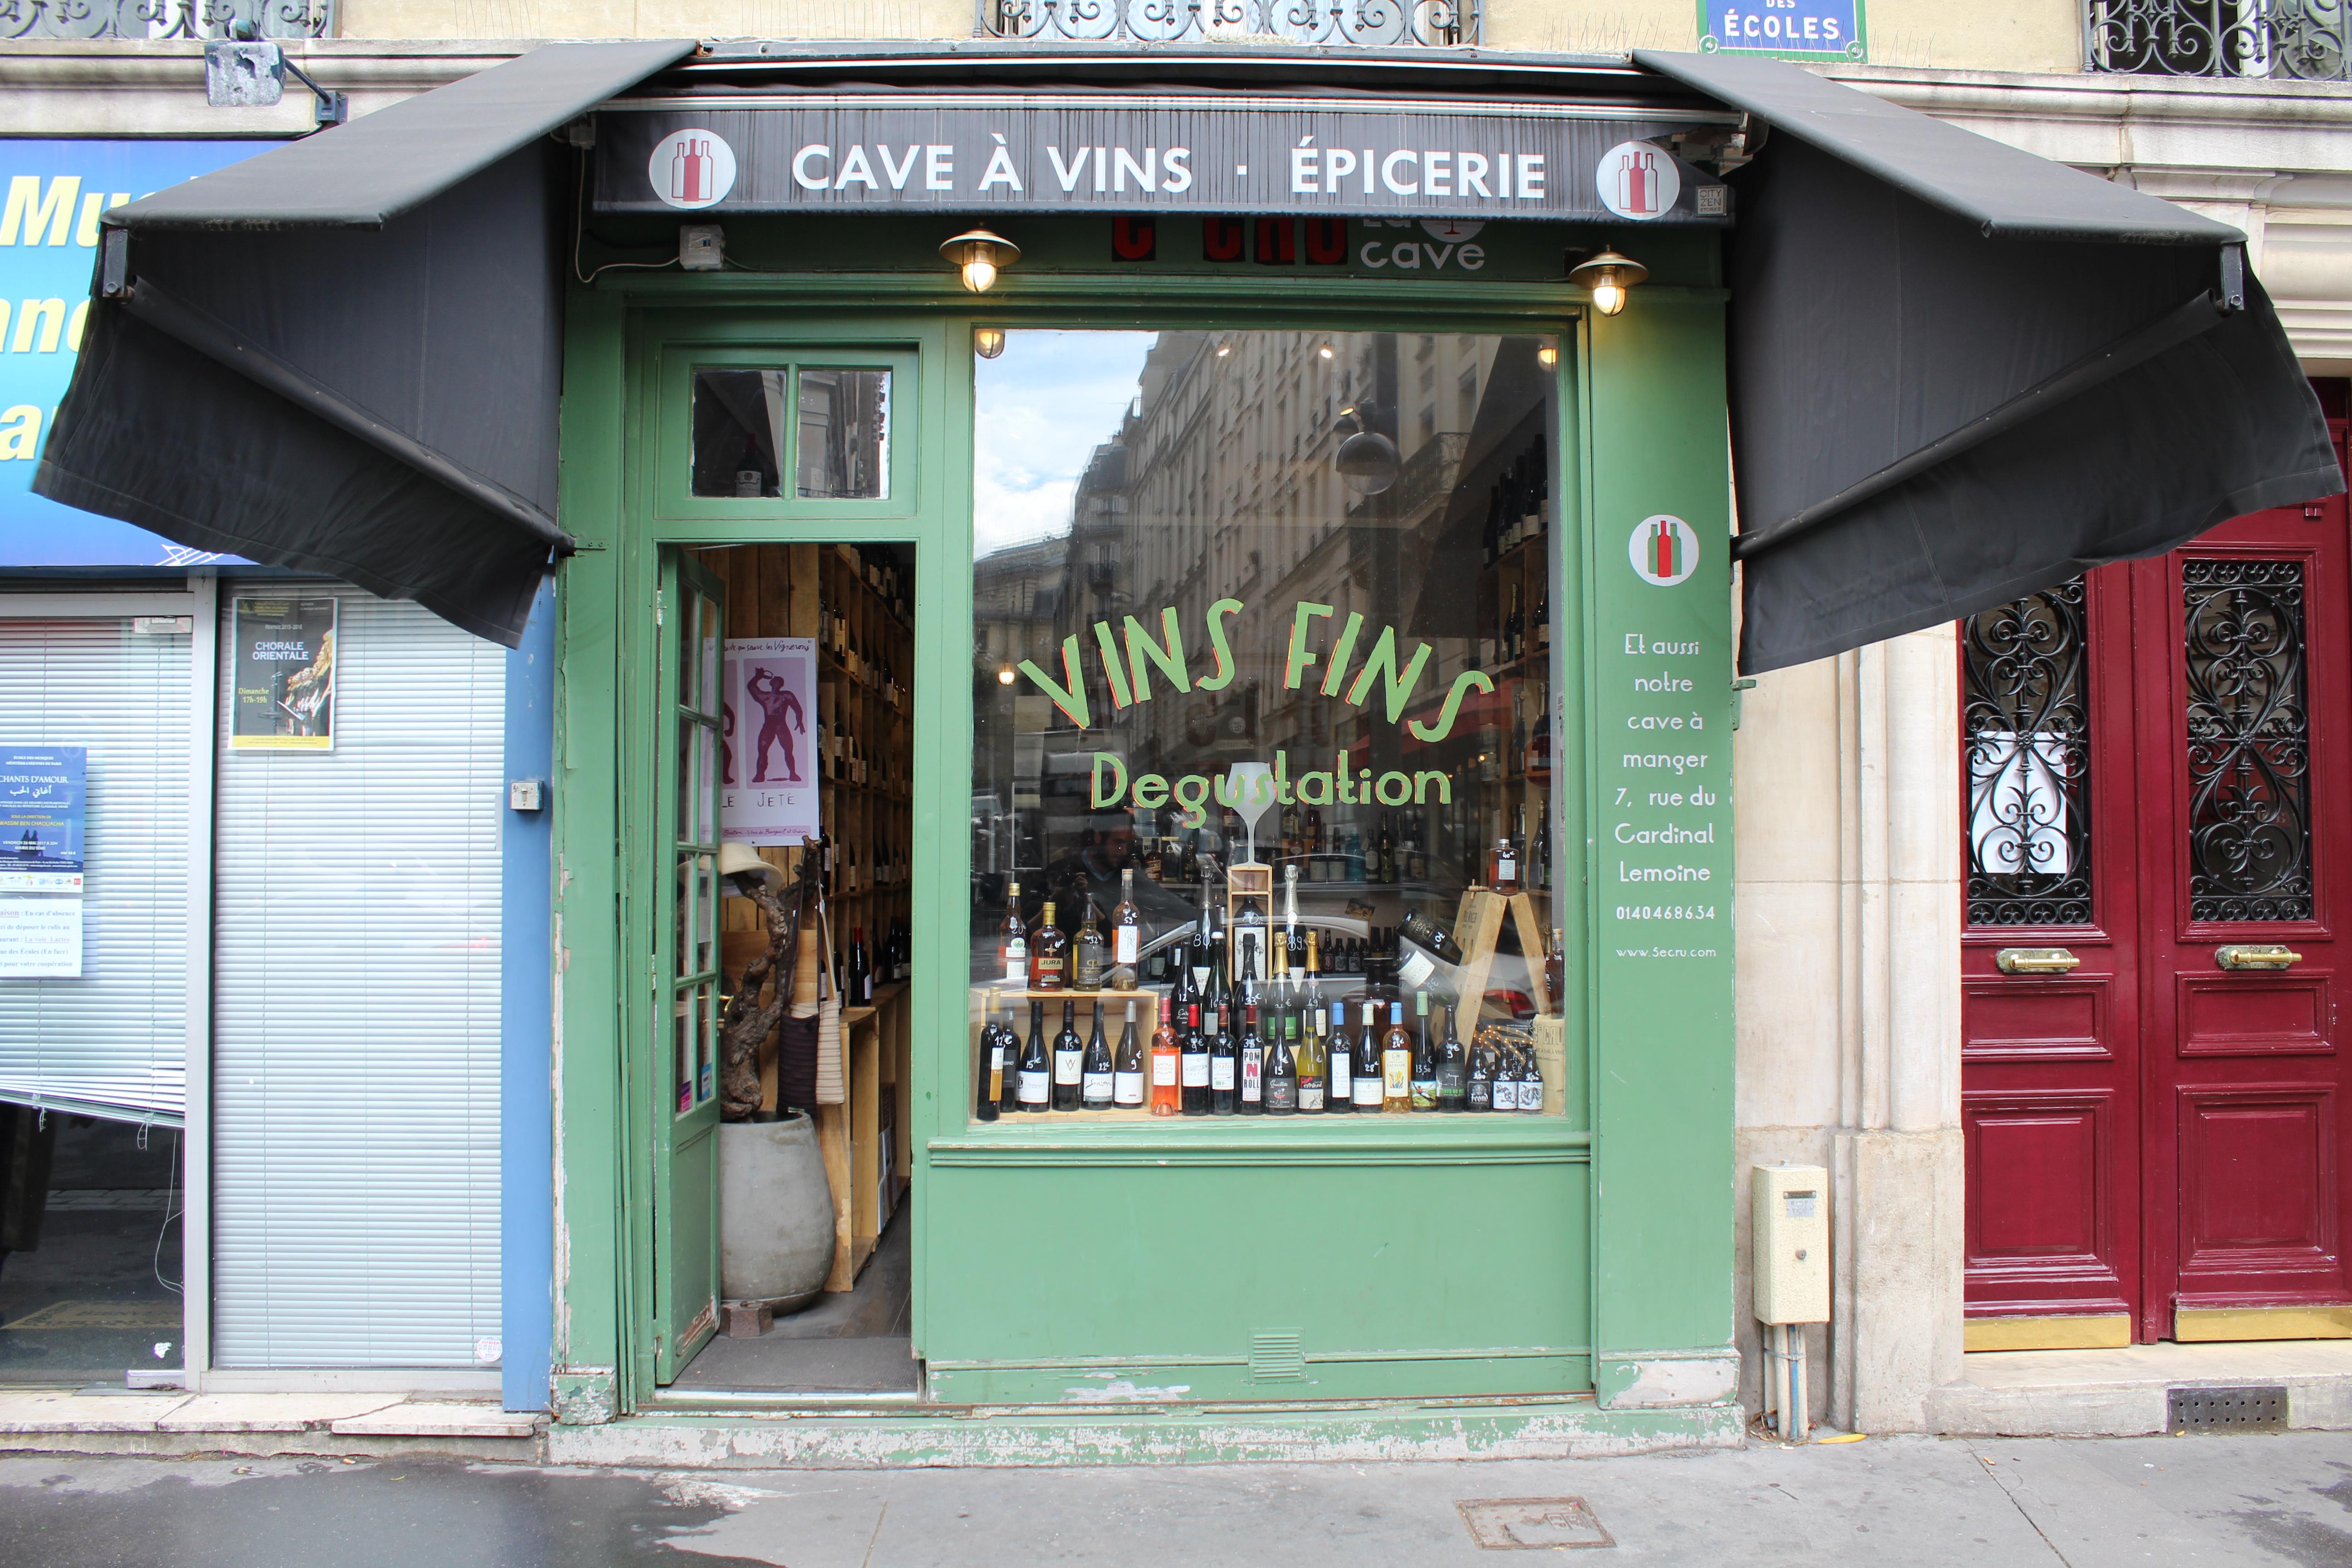 5ème Cru - Paris V - Message In A Window